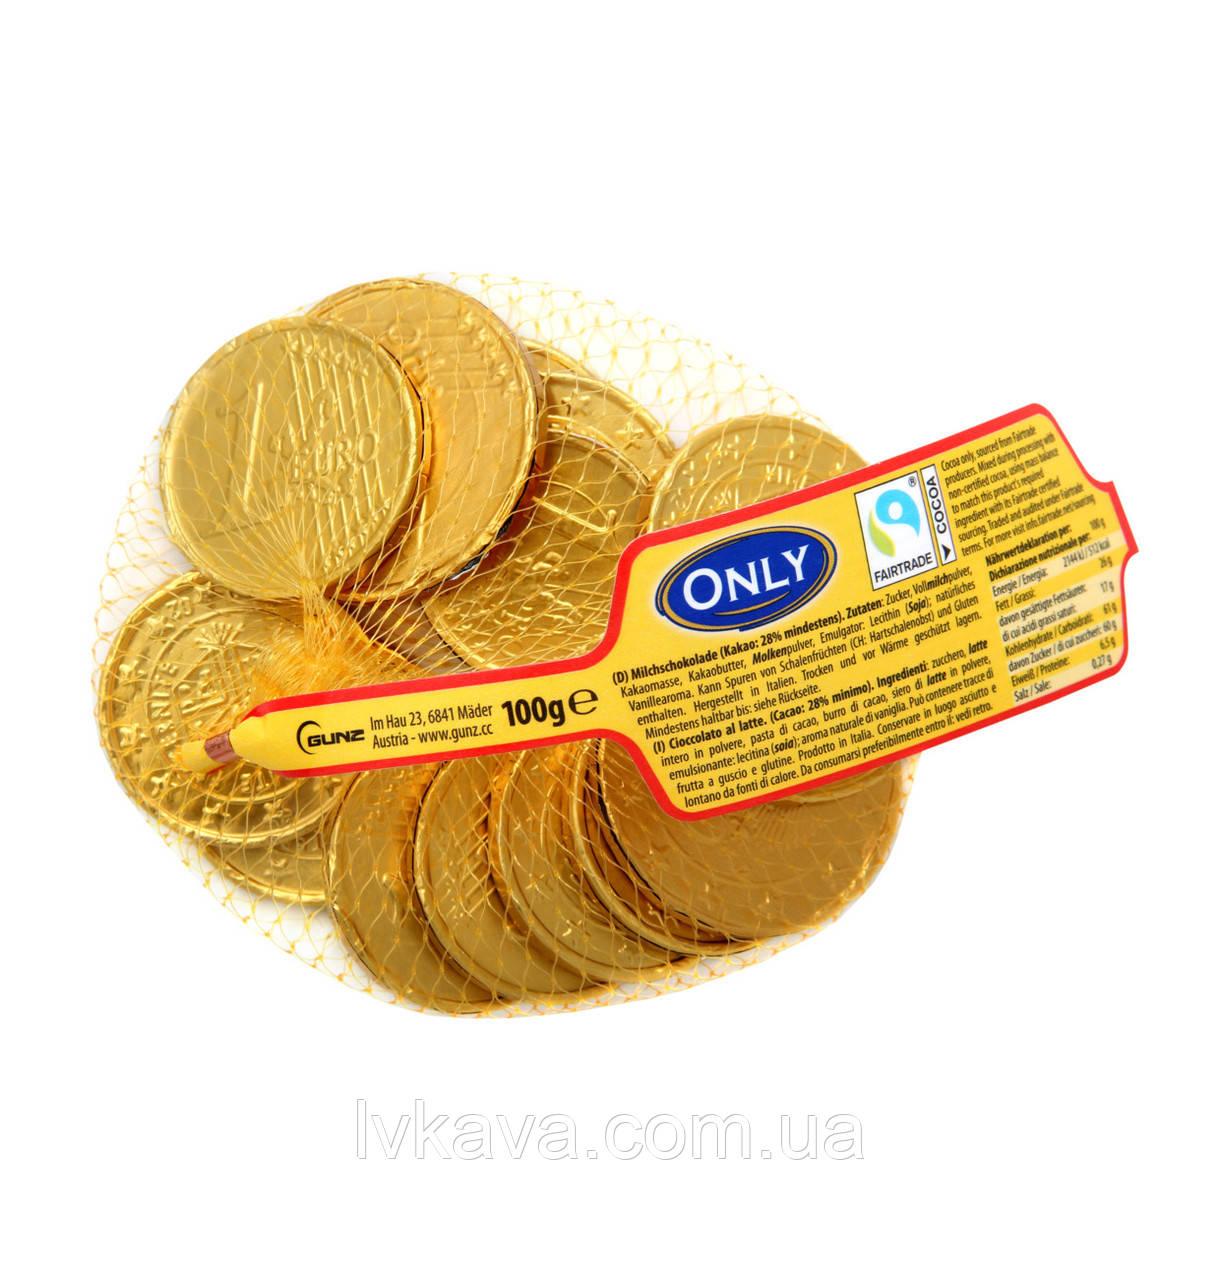 Молочный шоколад Gold coins  Only, 100 гр